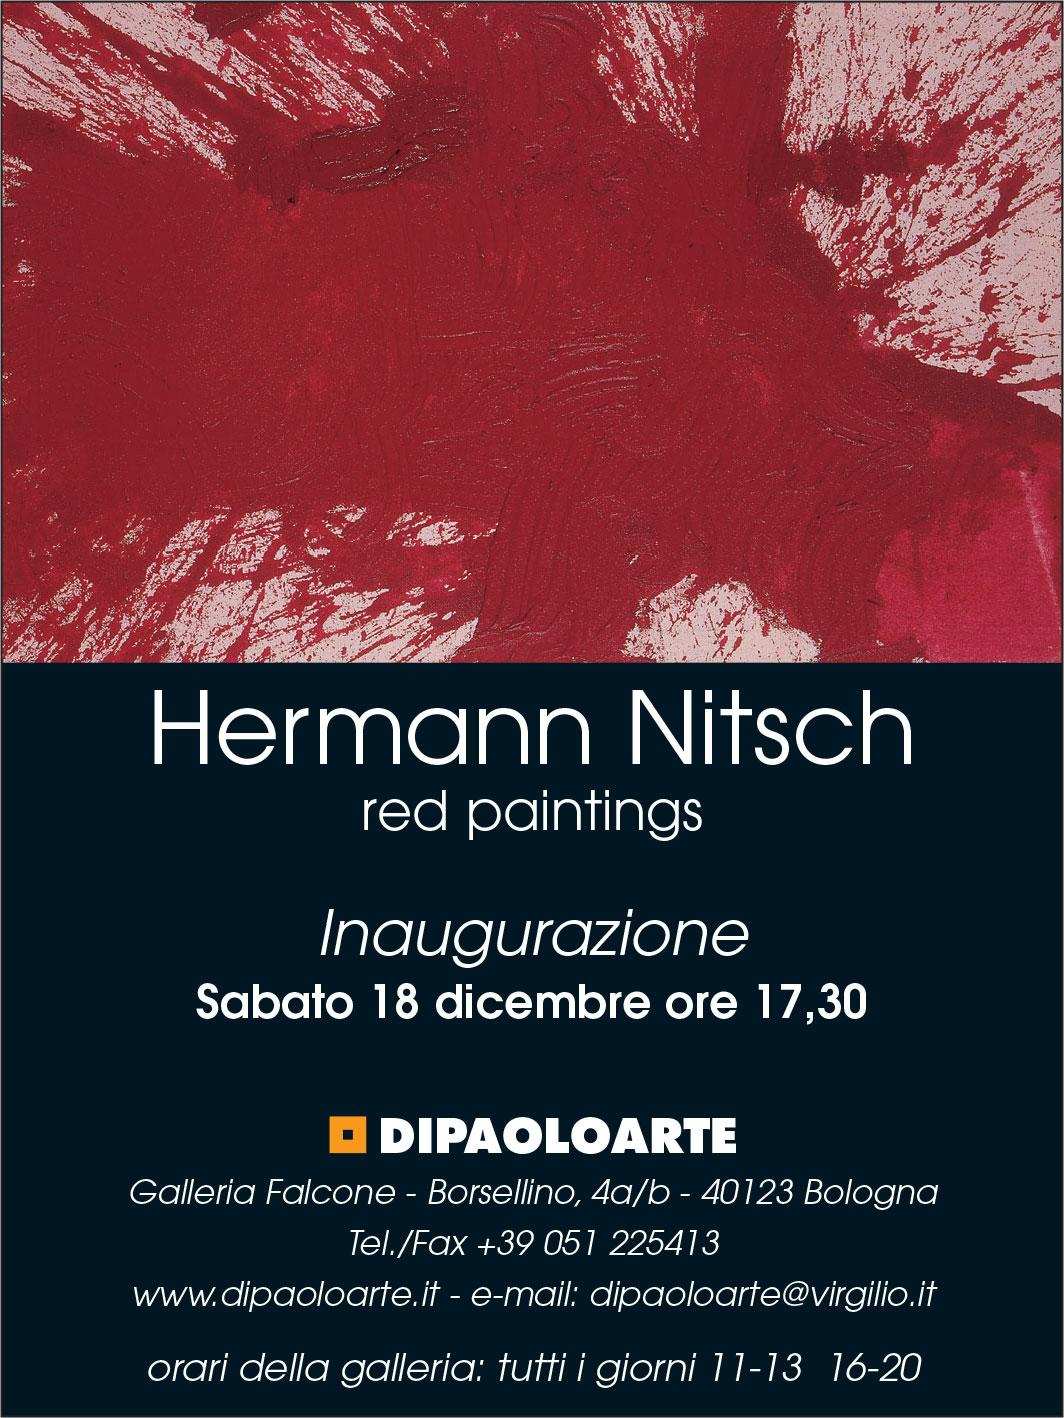 Invito-mostra-Nitsch